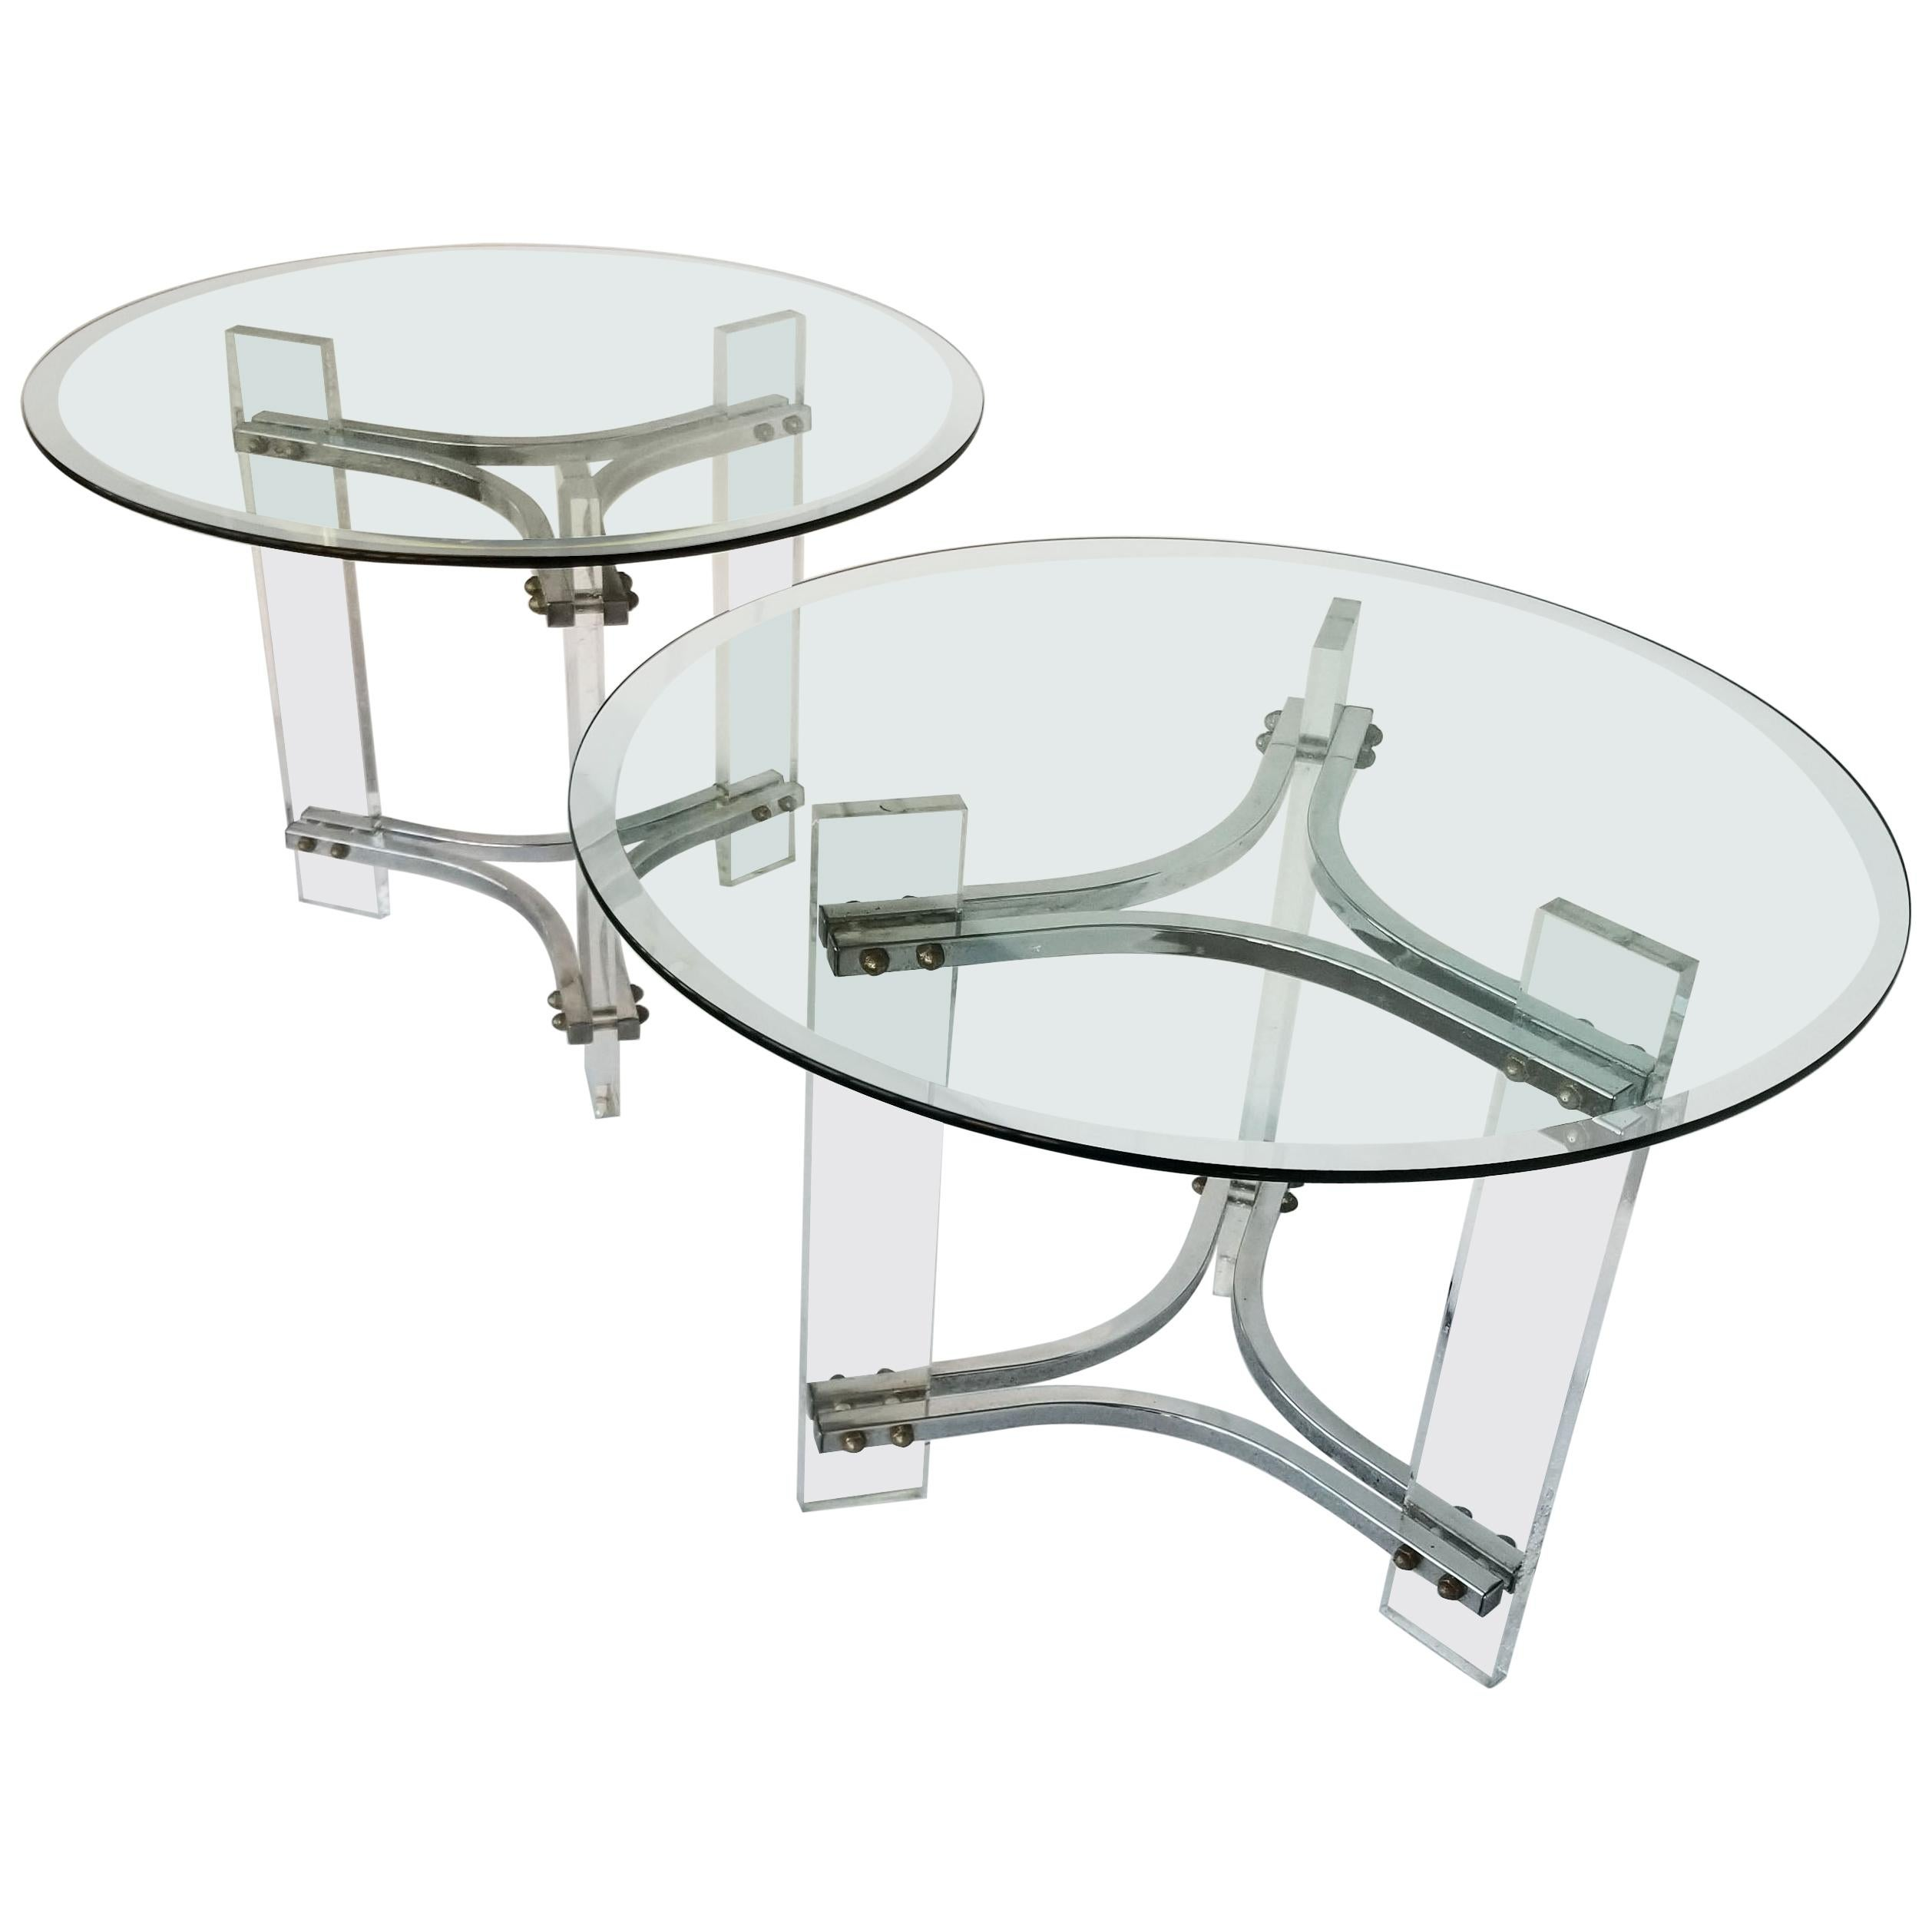 Charles Hollis Jones Style Mid-Century Modern Lucite & Chrome Side Table - Pair